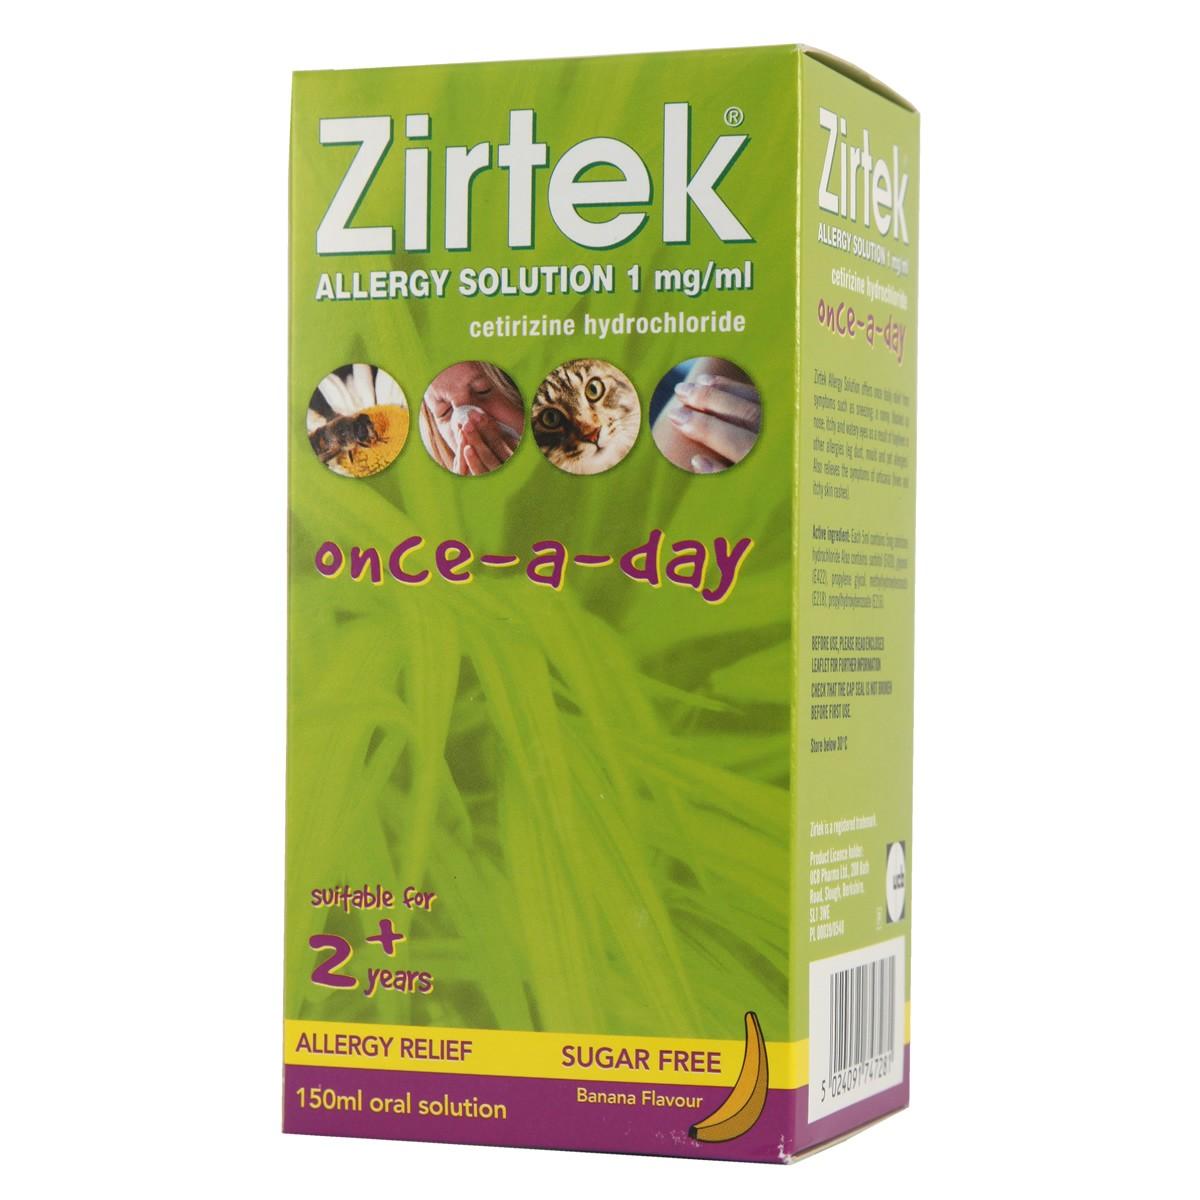 Zirtek Allergy Solution Once-a-Day